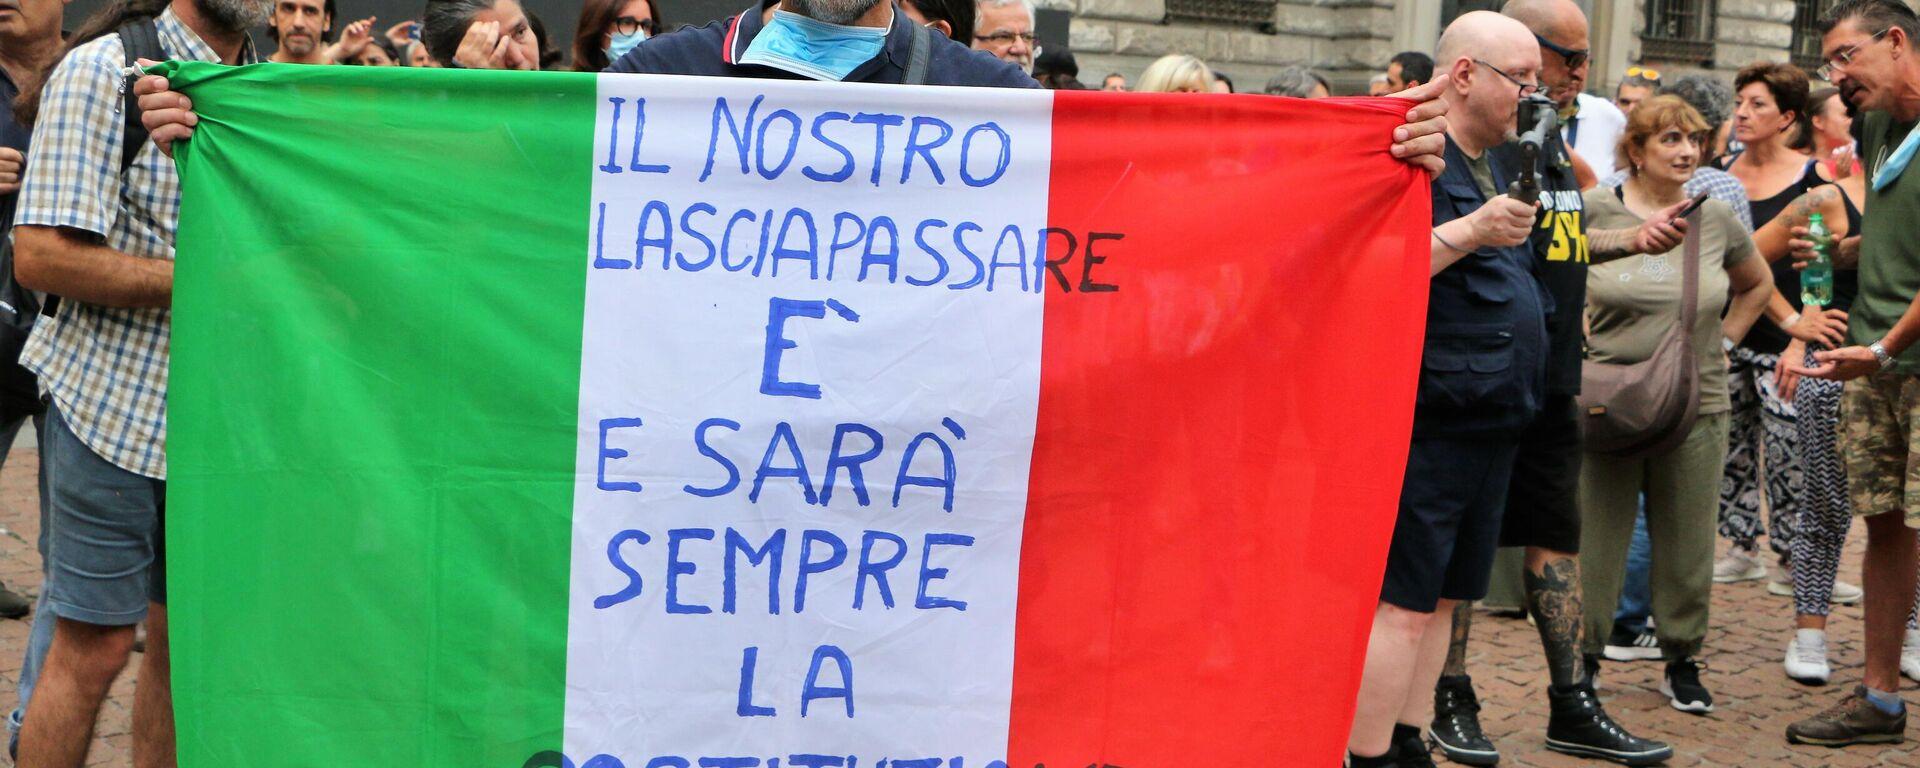 Manifestazione No Green Pass, Milano 31.07 - Sputnik Italia, 1920, 25.09.2021